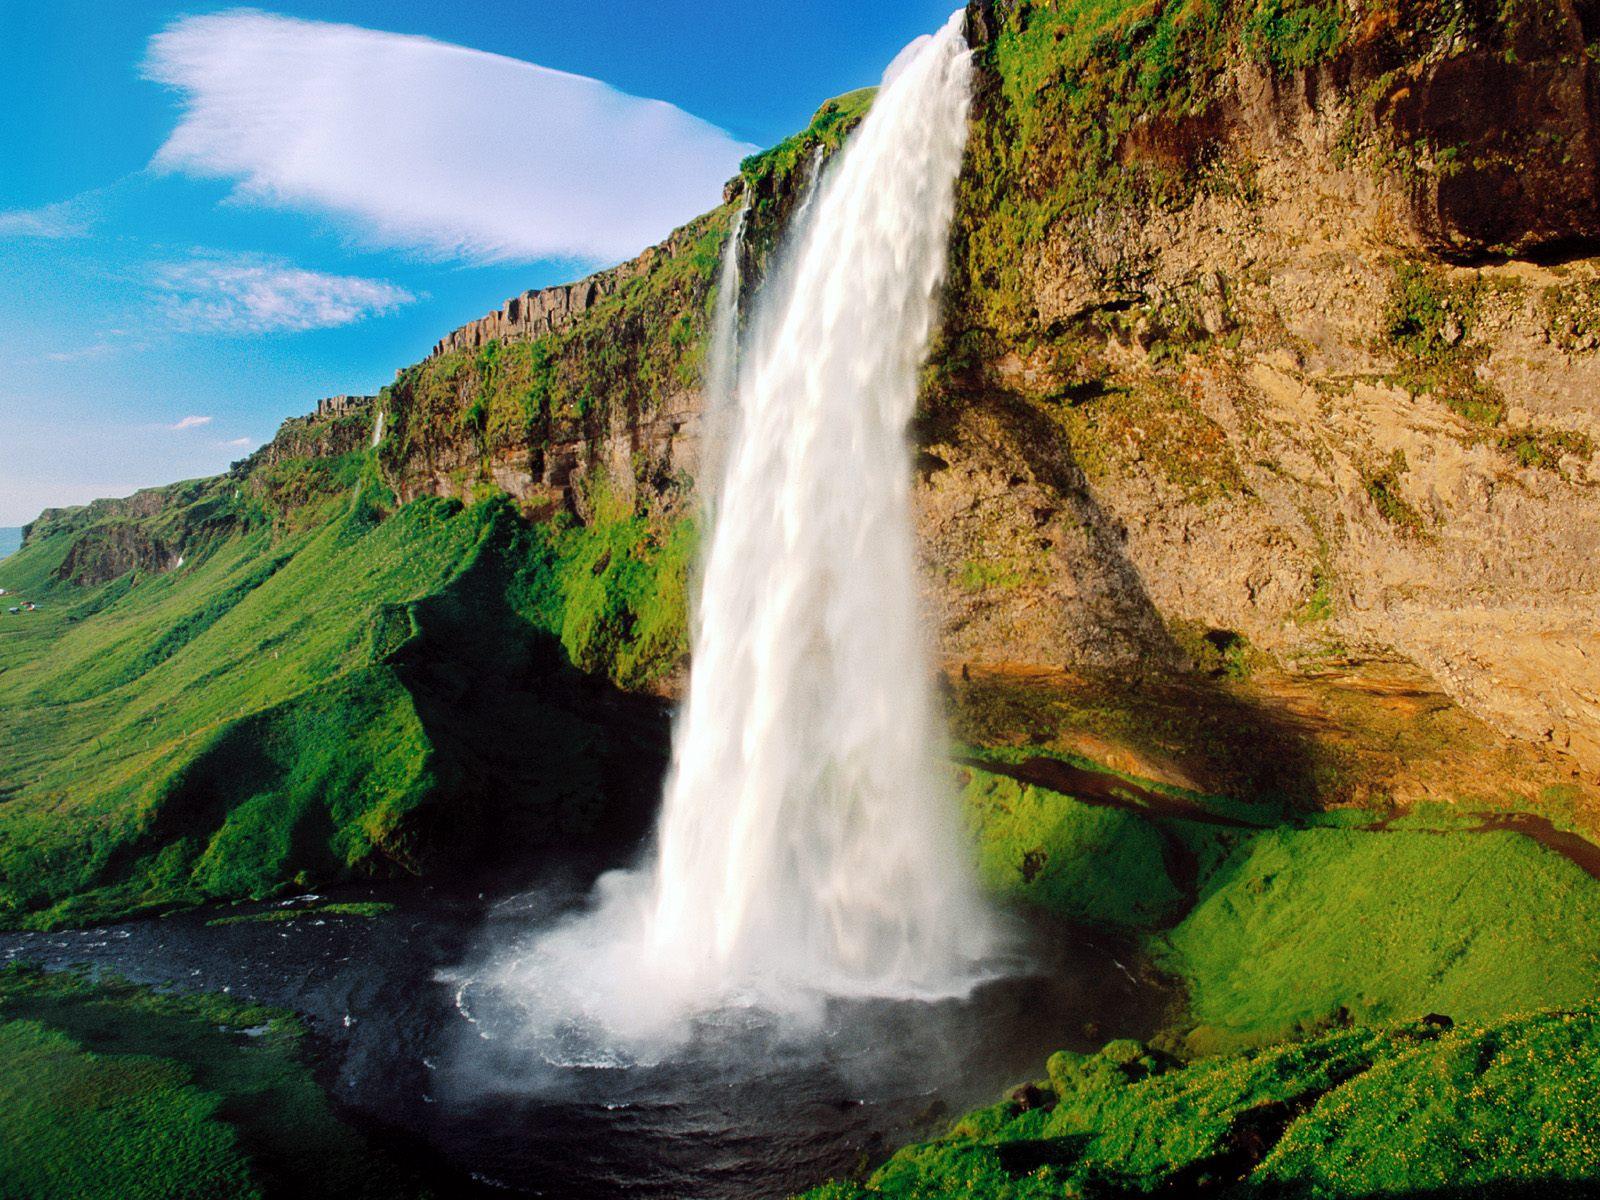 https://1.bp.blogspot.com/-JcPIbFLt22I/TcmPebO_5vI/AAAAAAAAABg/NqA9wfw-XPg/s1600/Waterfall-Wallpapers-Pack+%252817%2529.jpg